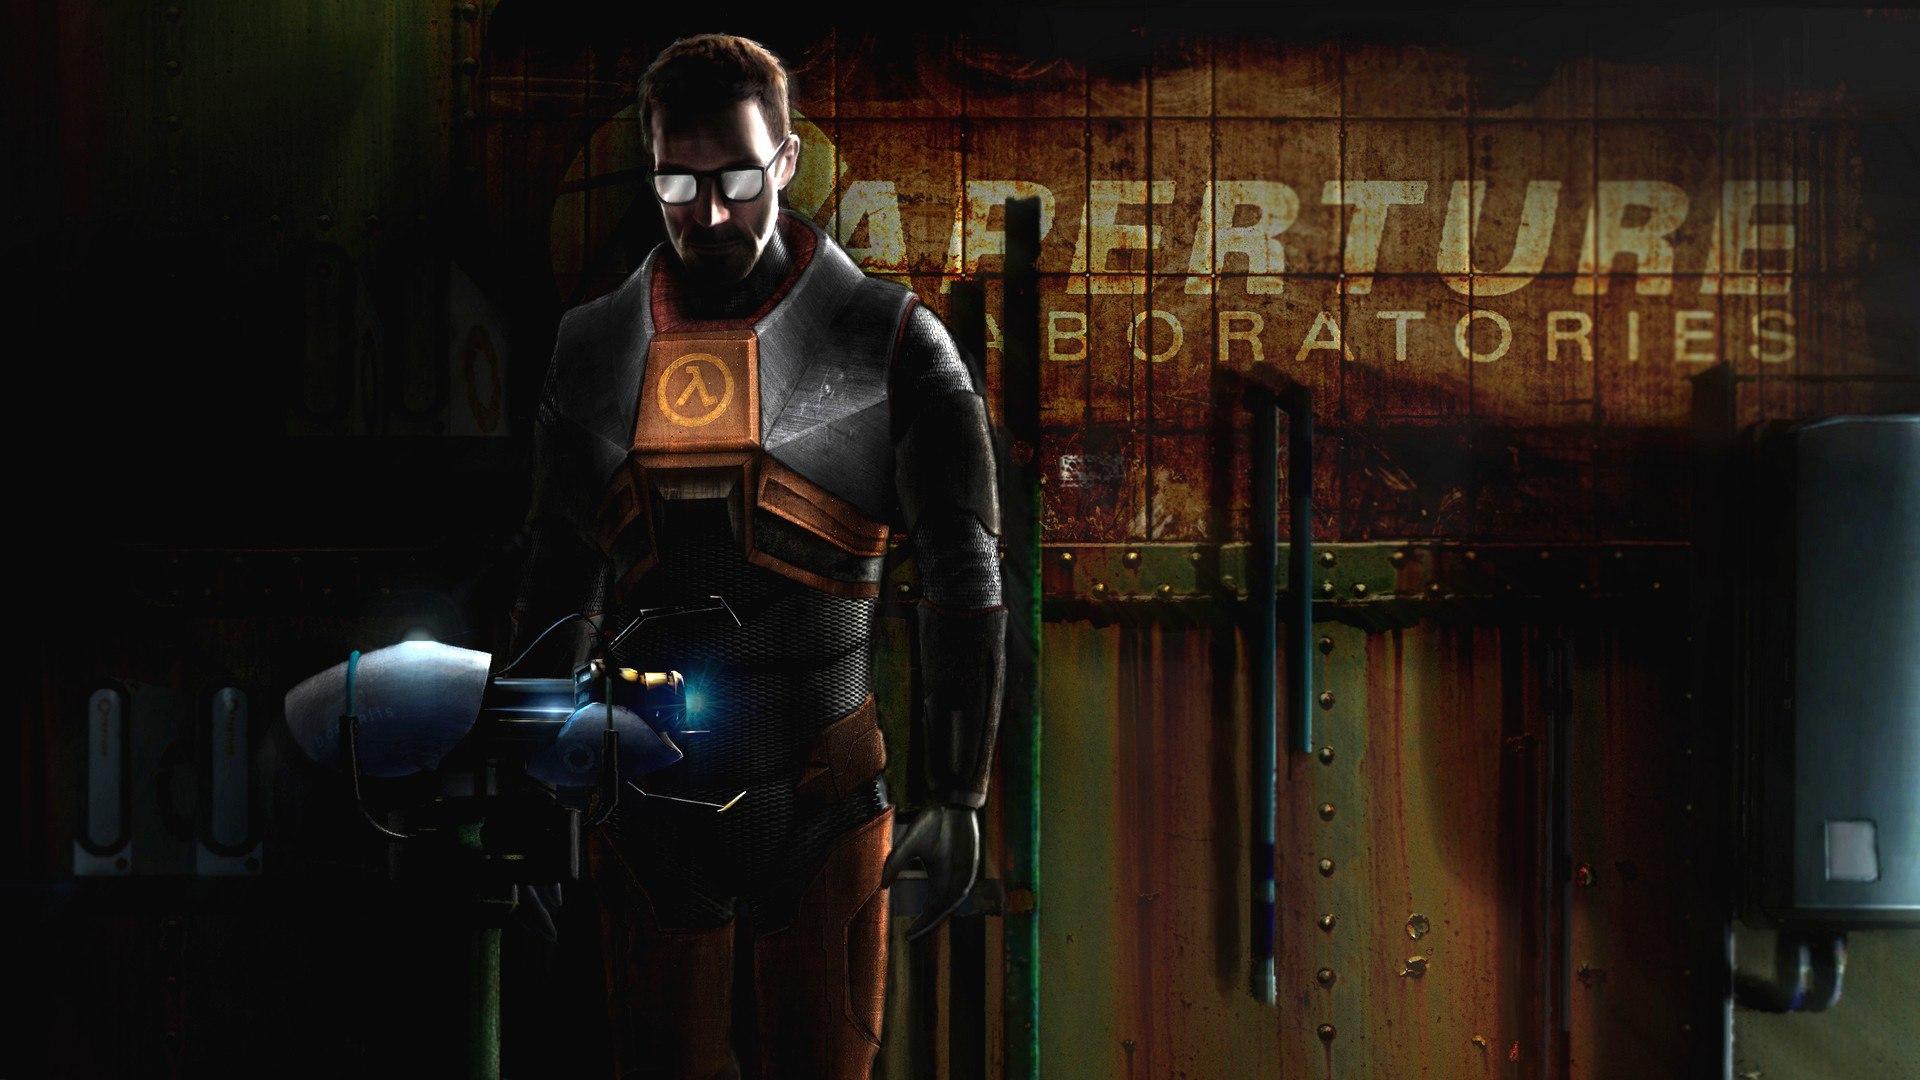 Гордон Фримен - Half-Life 2 Арт, Персонаж